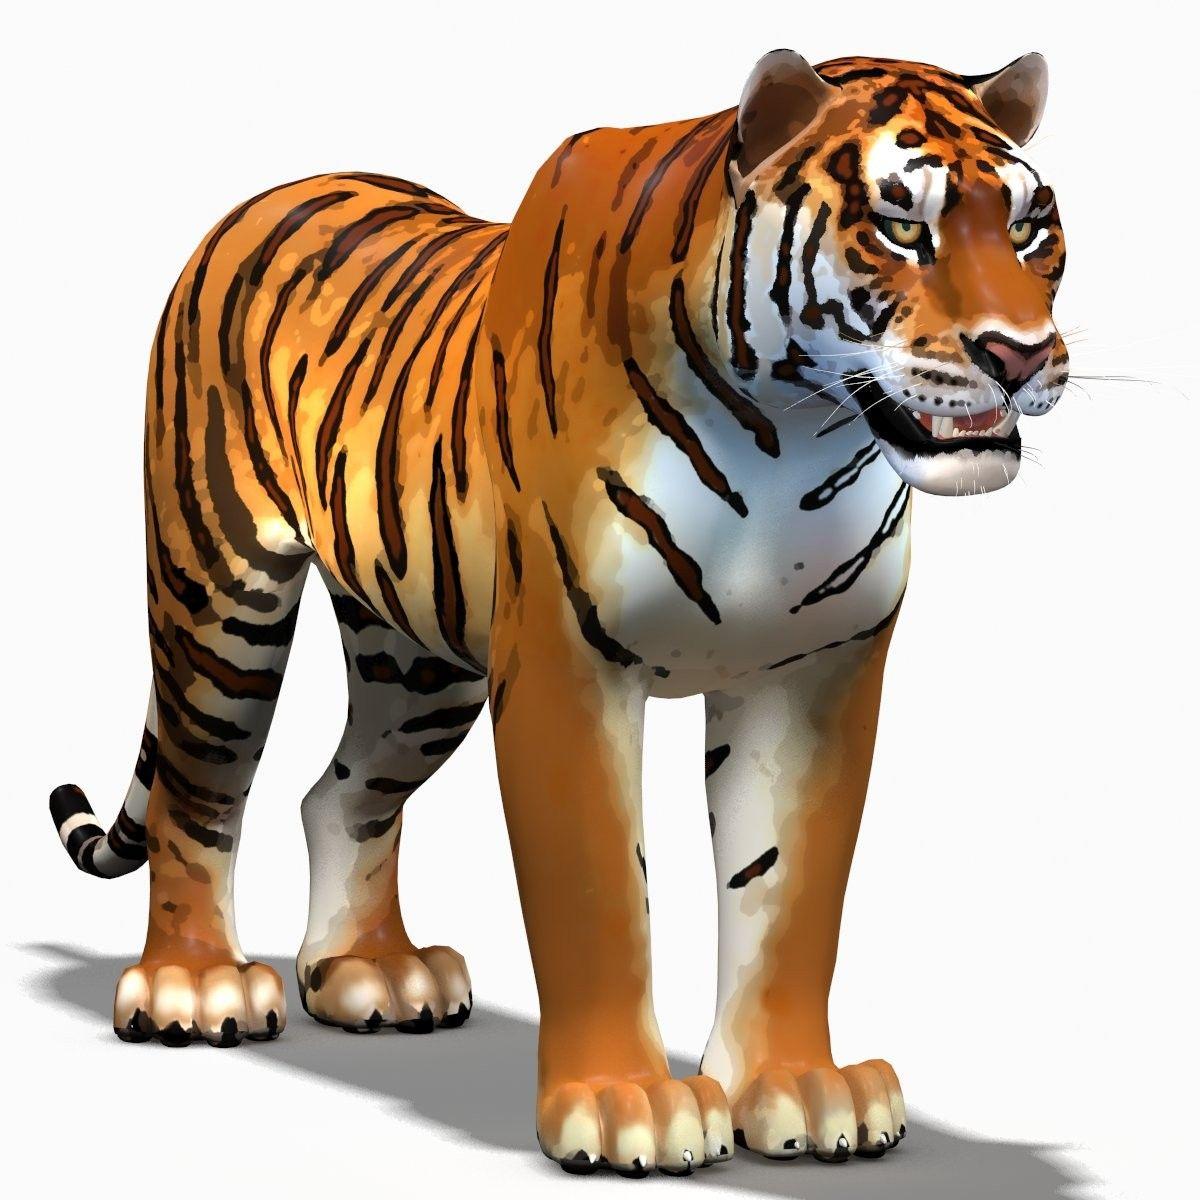 3d Cartoon Tiger Cartoon Tiger 3d Cartoon Cartoon